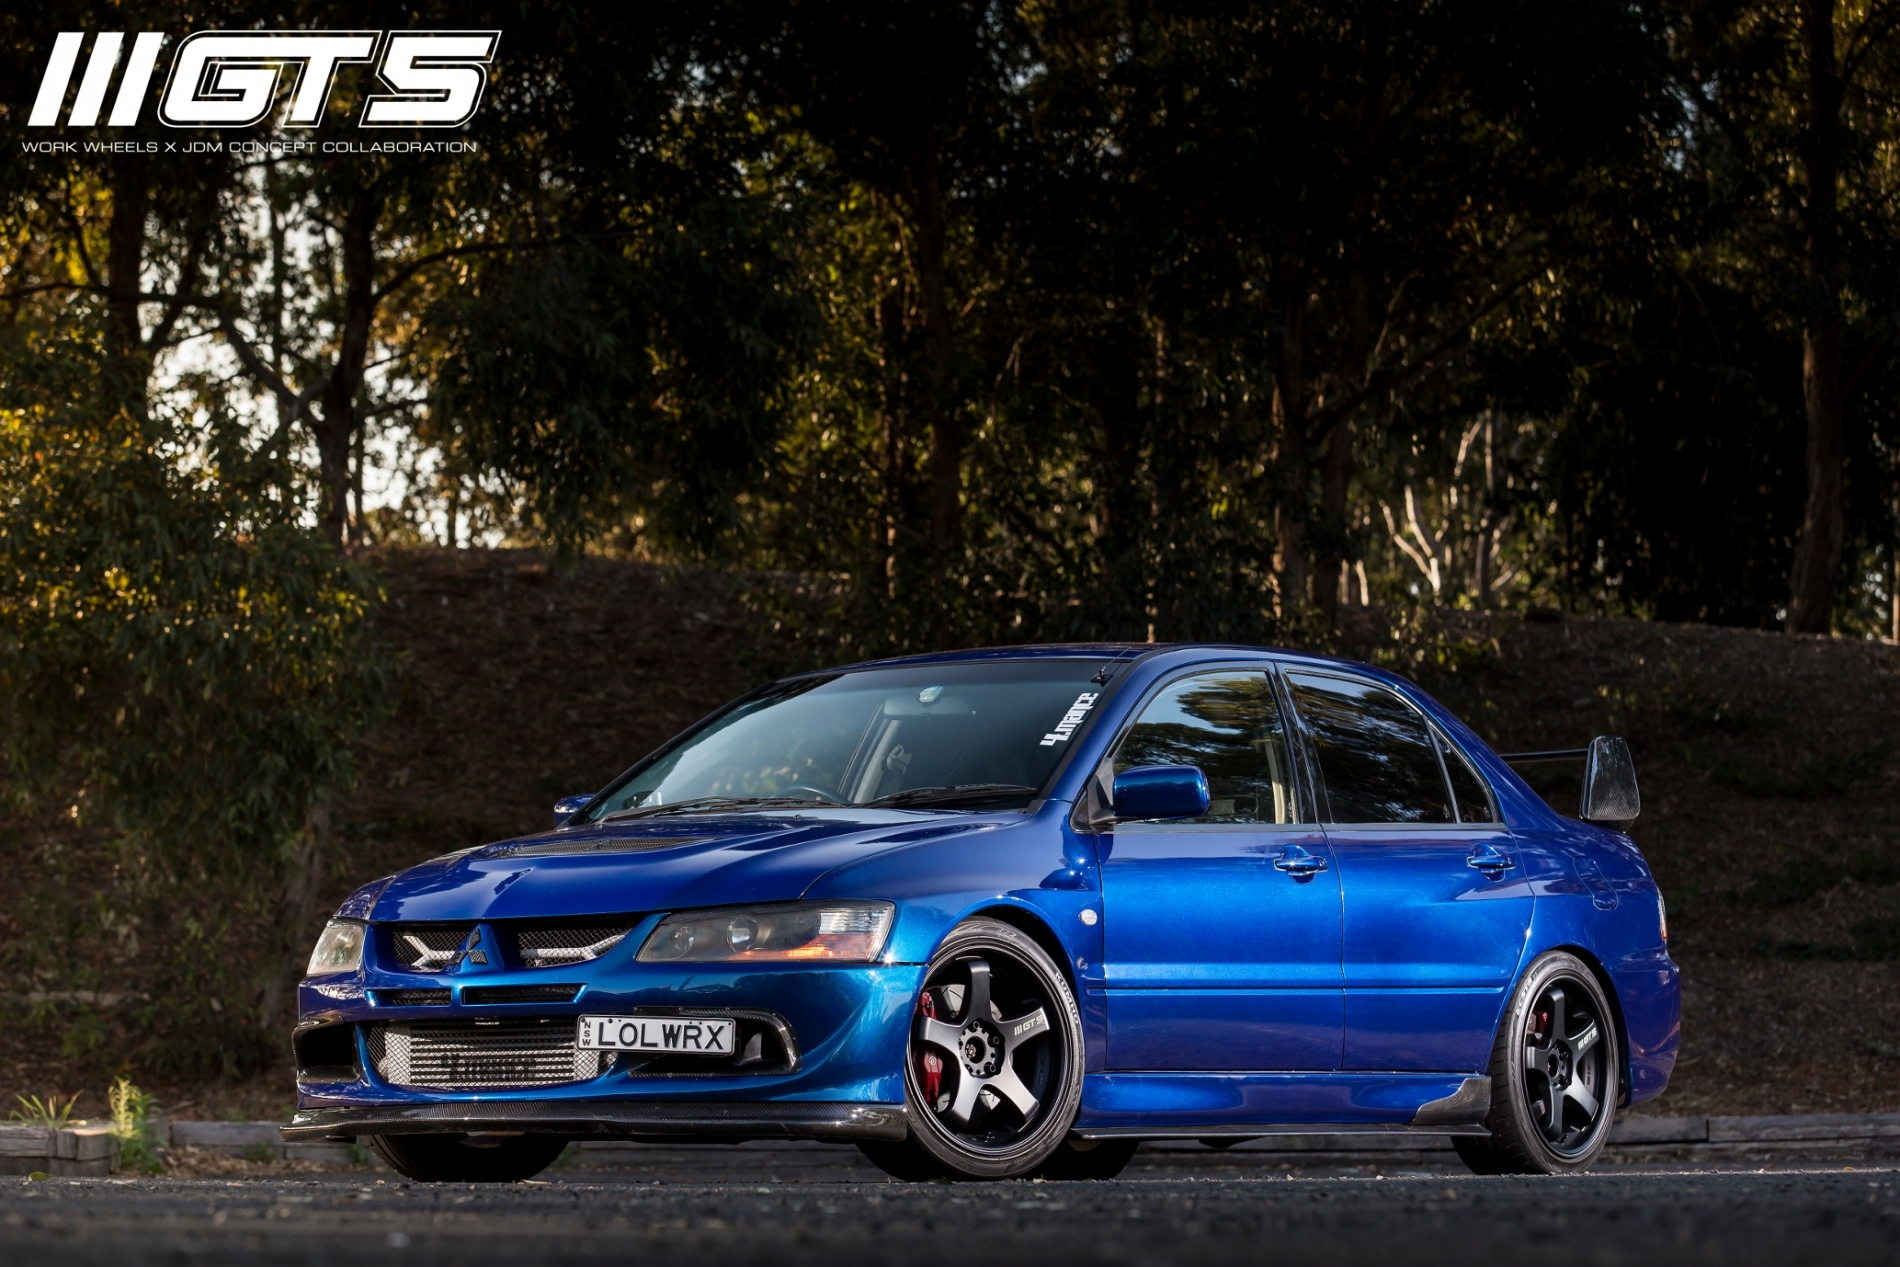 Work Wheels Australia X Jdm Concept Gt5 Blue Sti With White Rims Photo Gallery